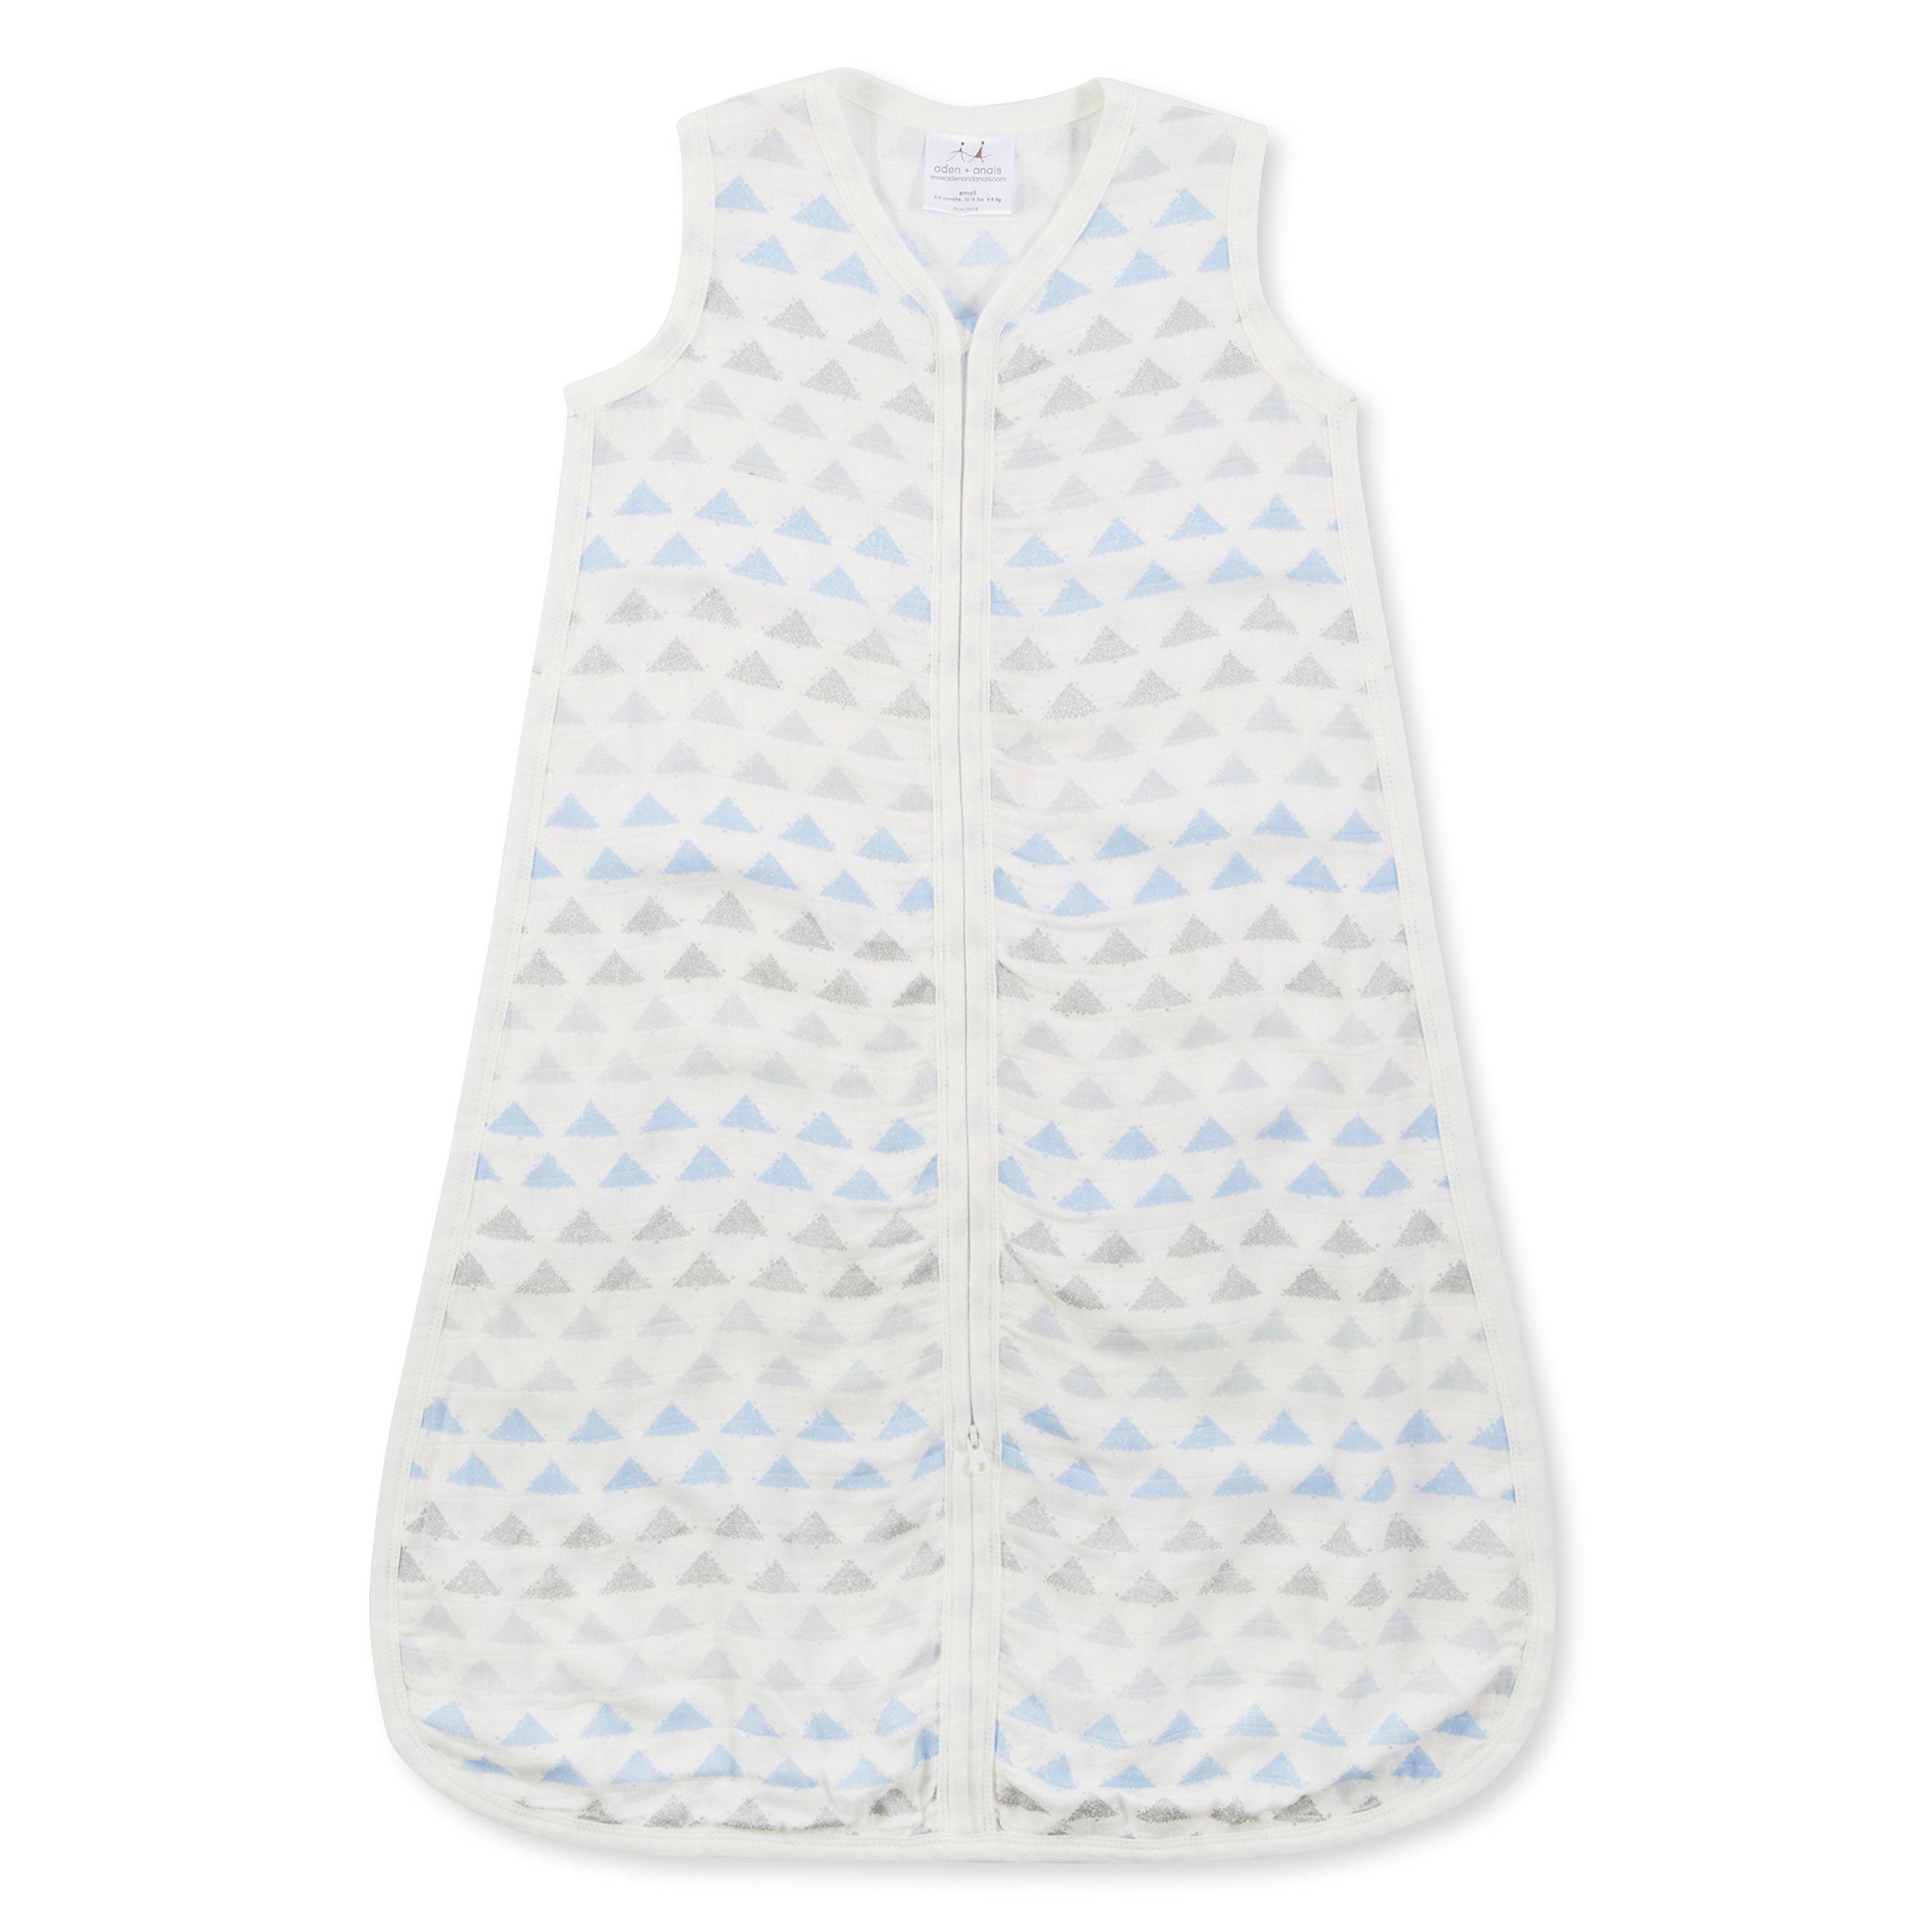 aden + anais Silky Soft Metallic Sleeping Bag; 100% Cotton Bamboo Muslin; Wearable Baby Blanket; Blue Moon Birch; Small; 0-6 Months